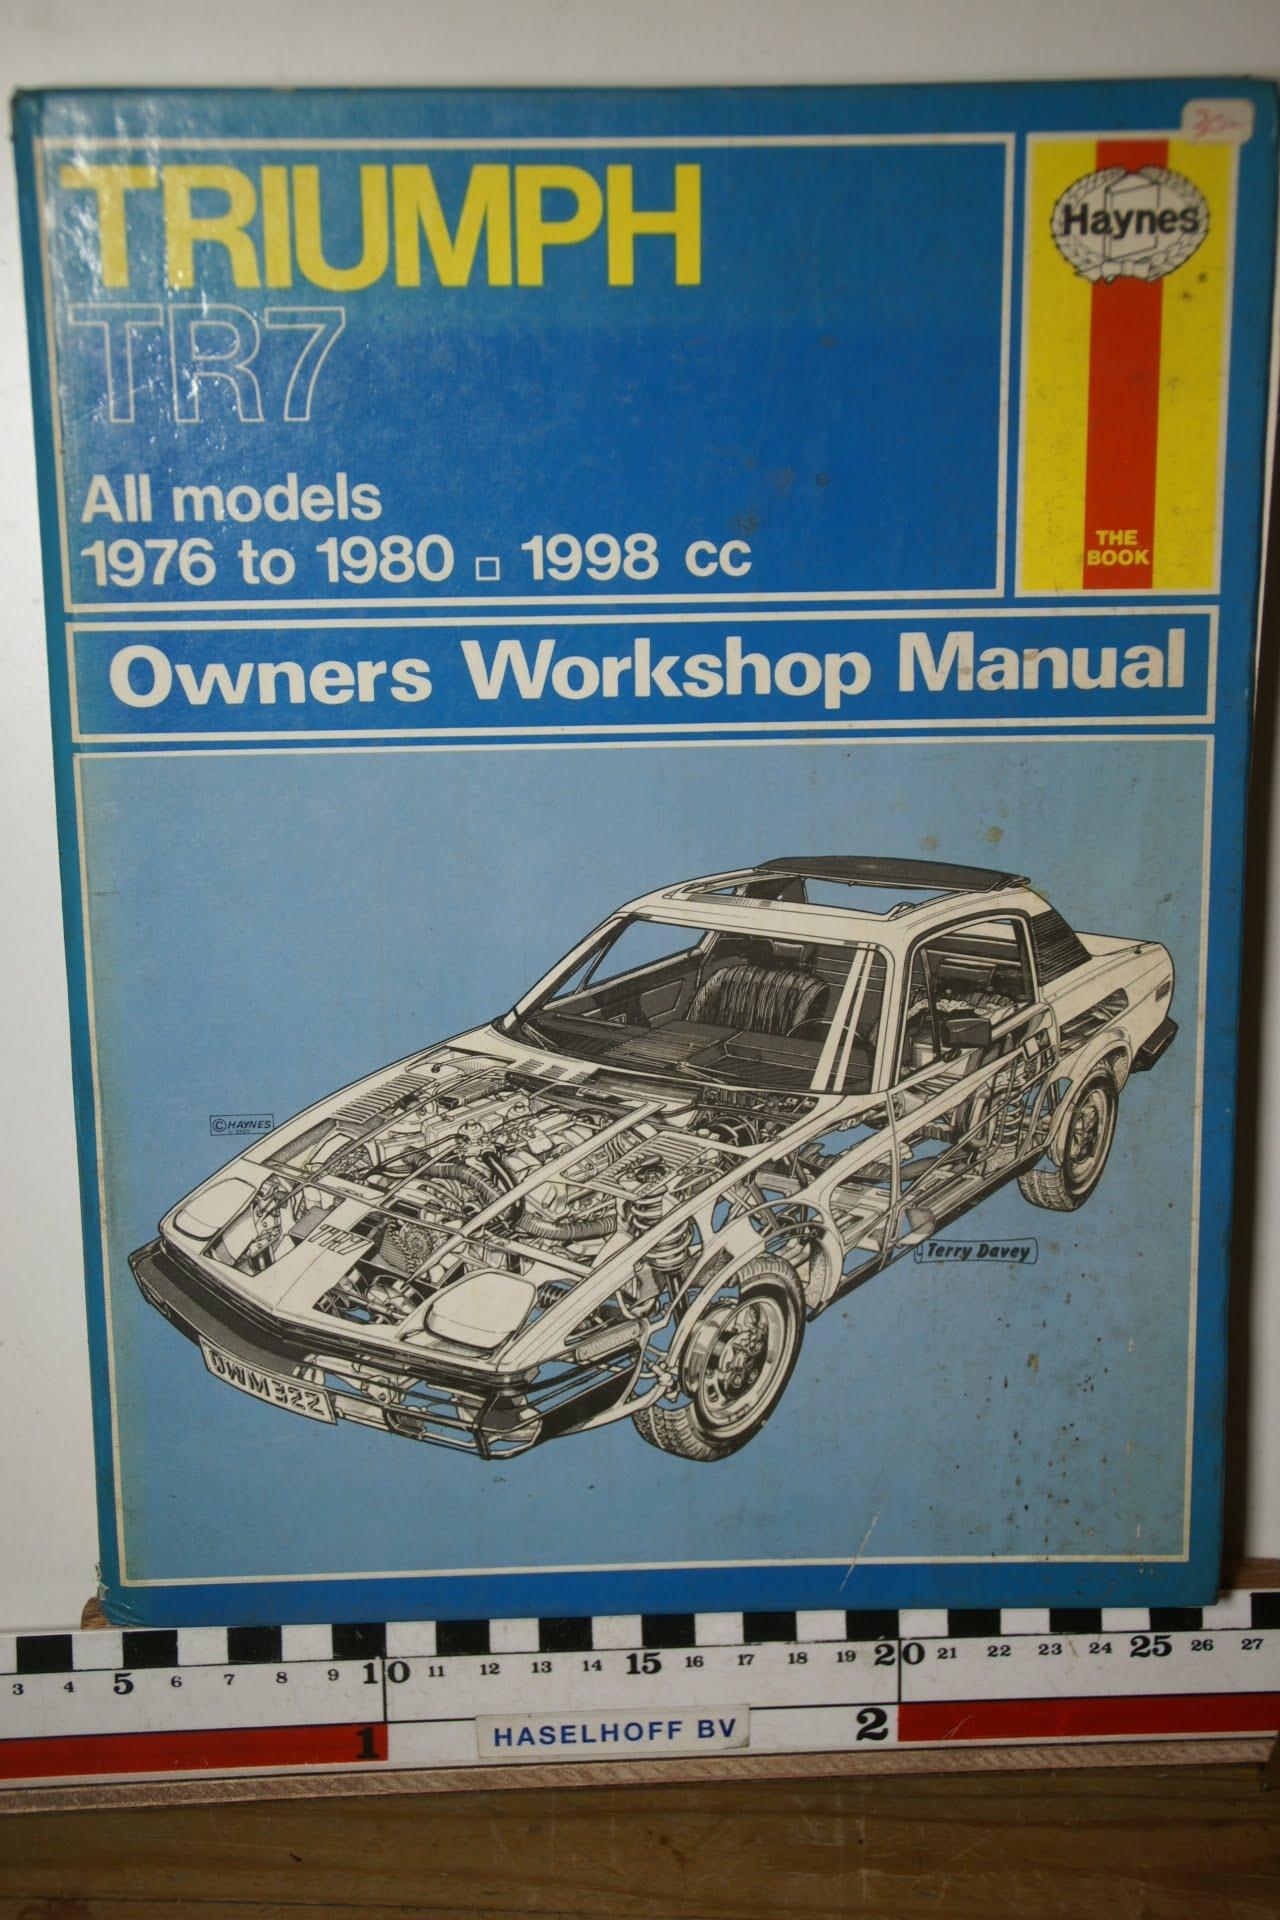 Haynes Triumph Owners Workshop Manual 180205-3704-0